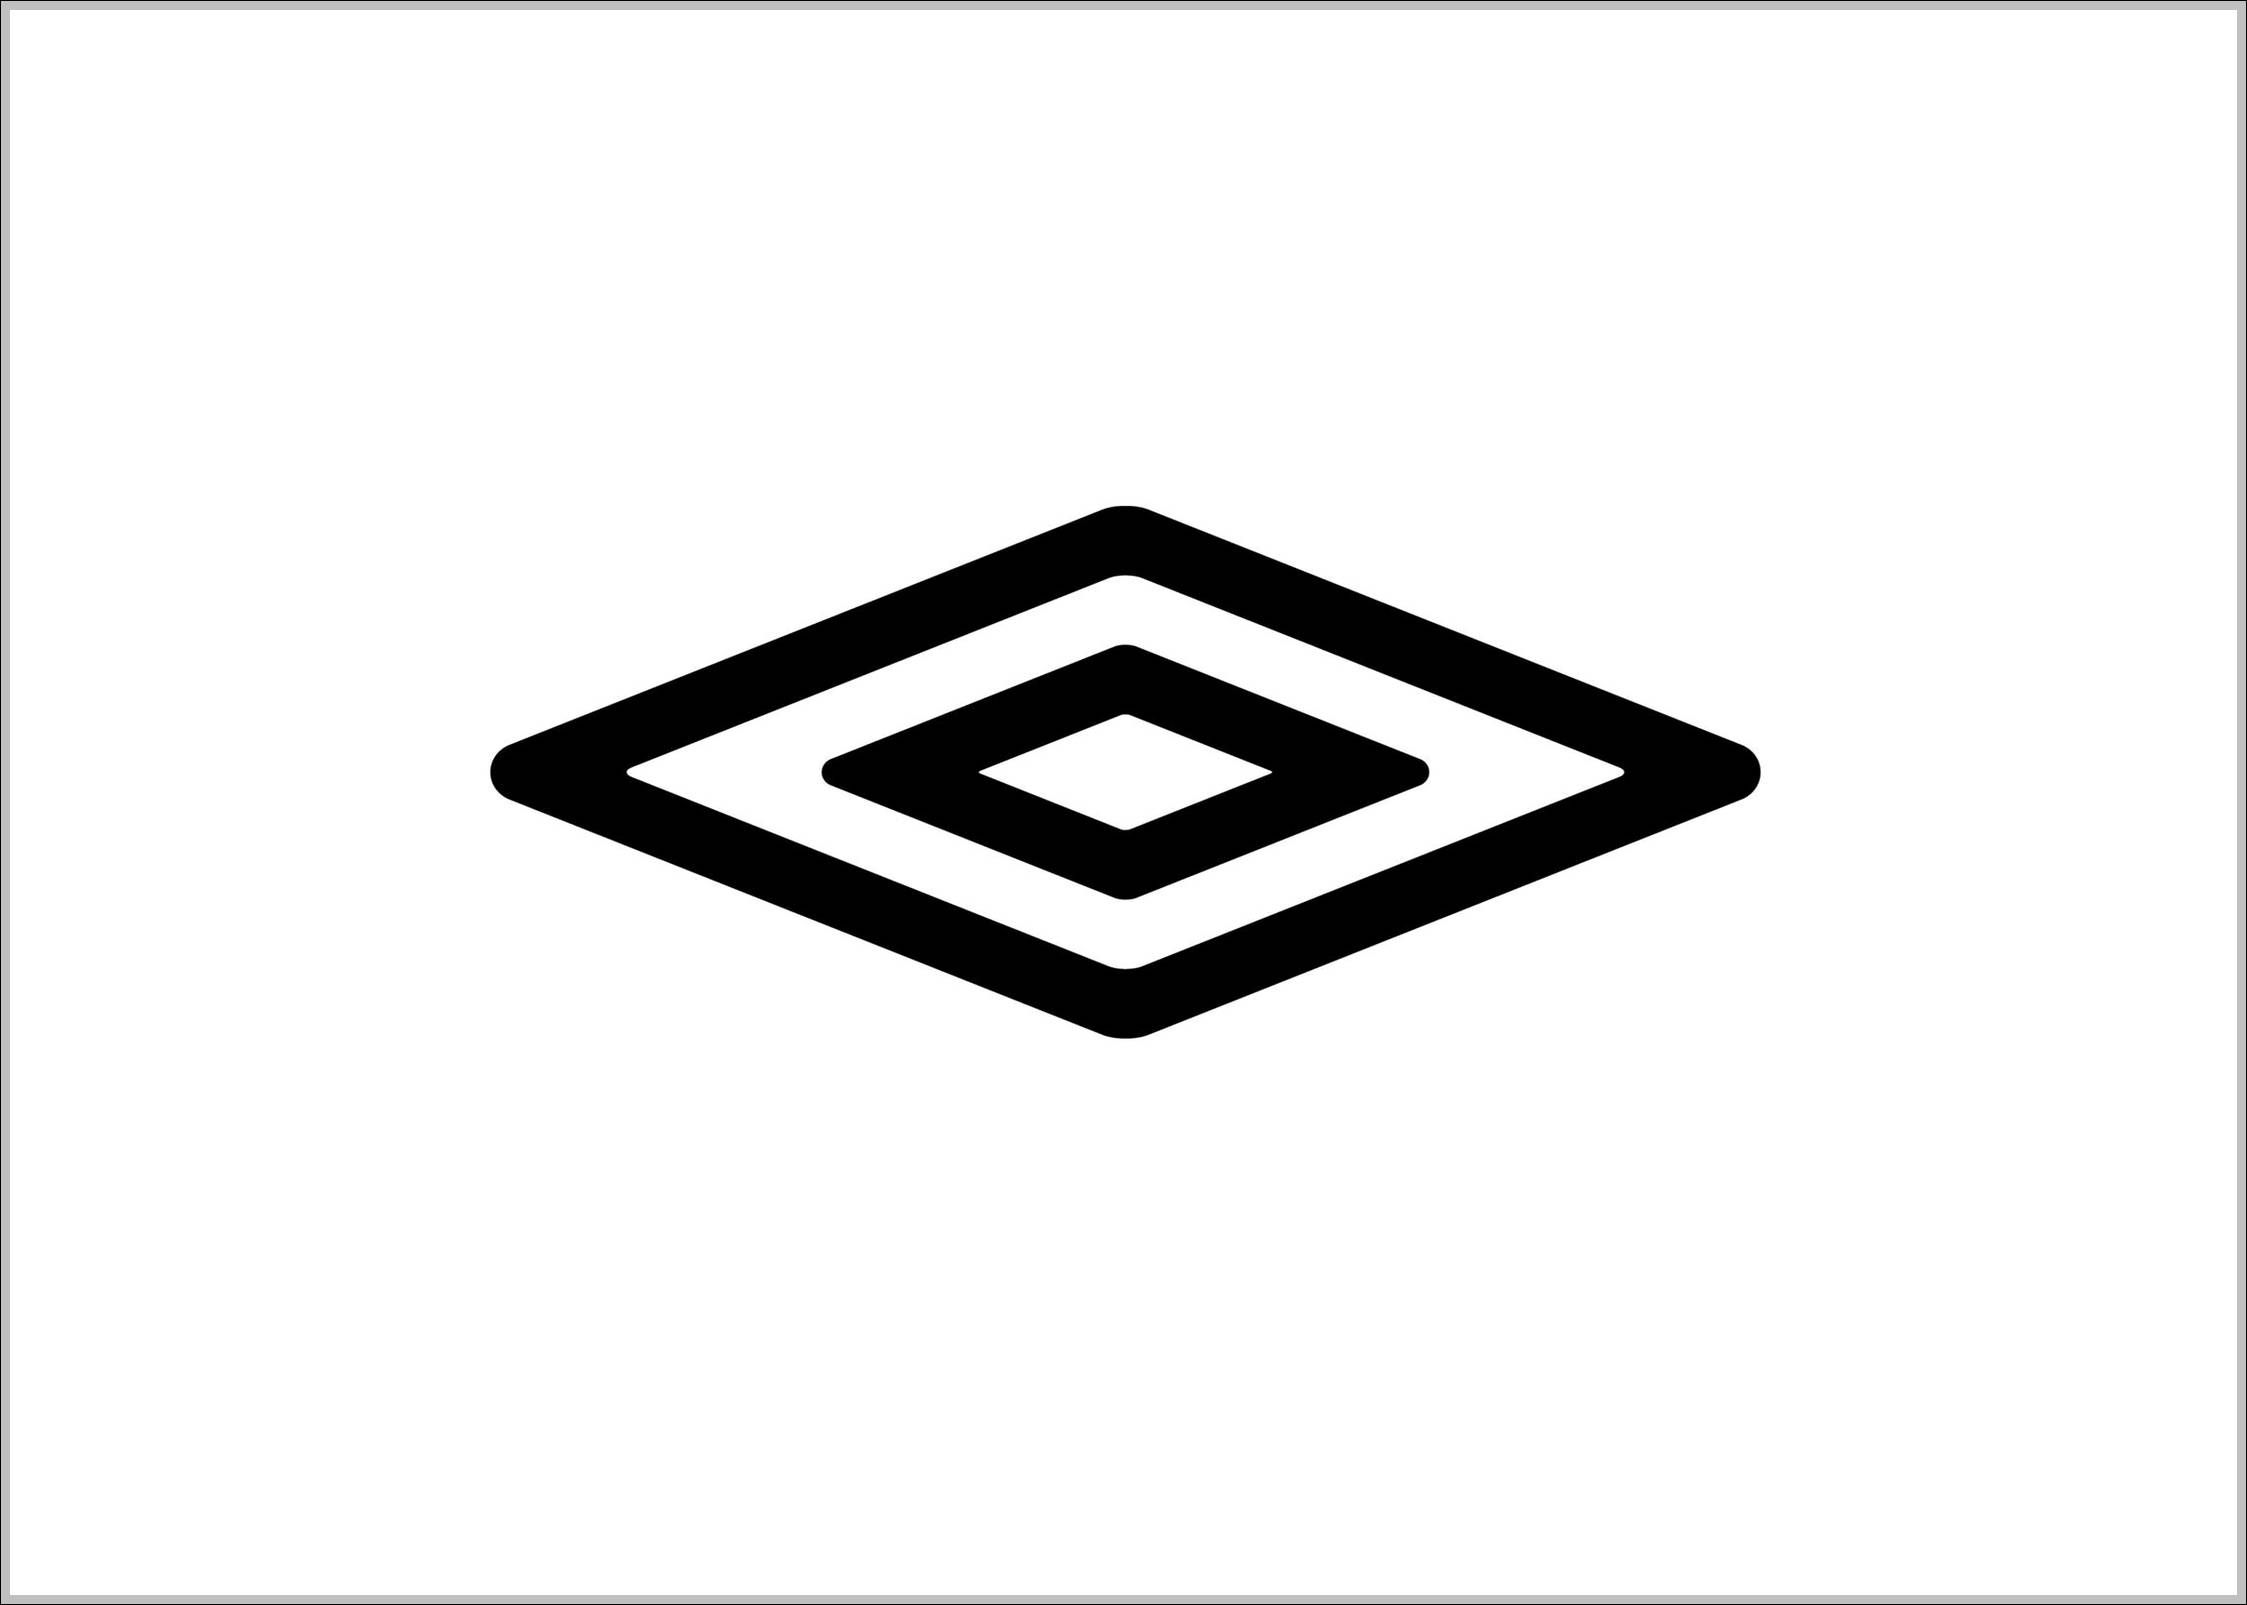 pg 13 symbol gallery meaning of text symbols rh sardignalibera net pg13 logo pg 13 logo png